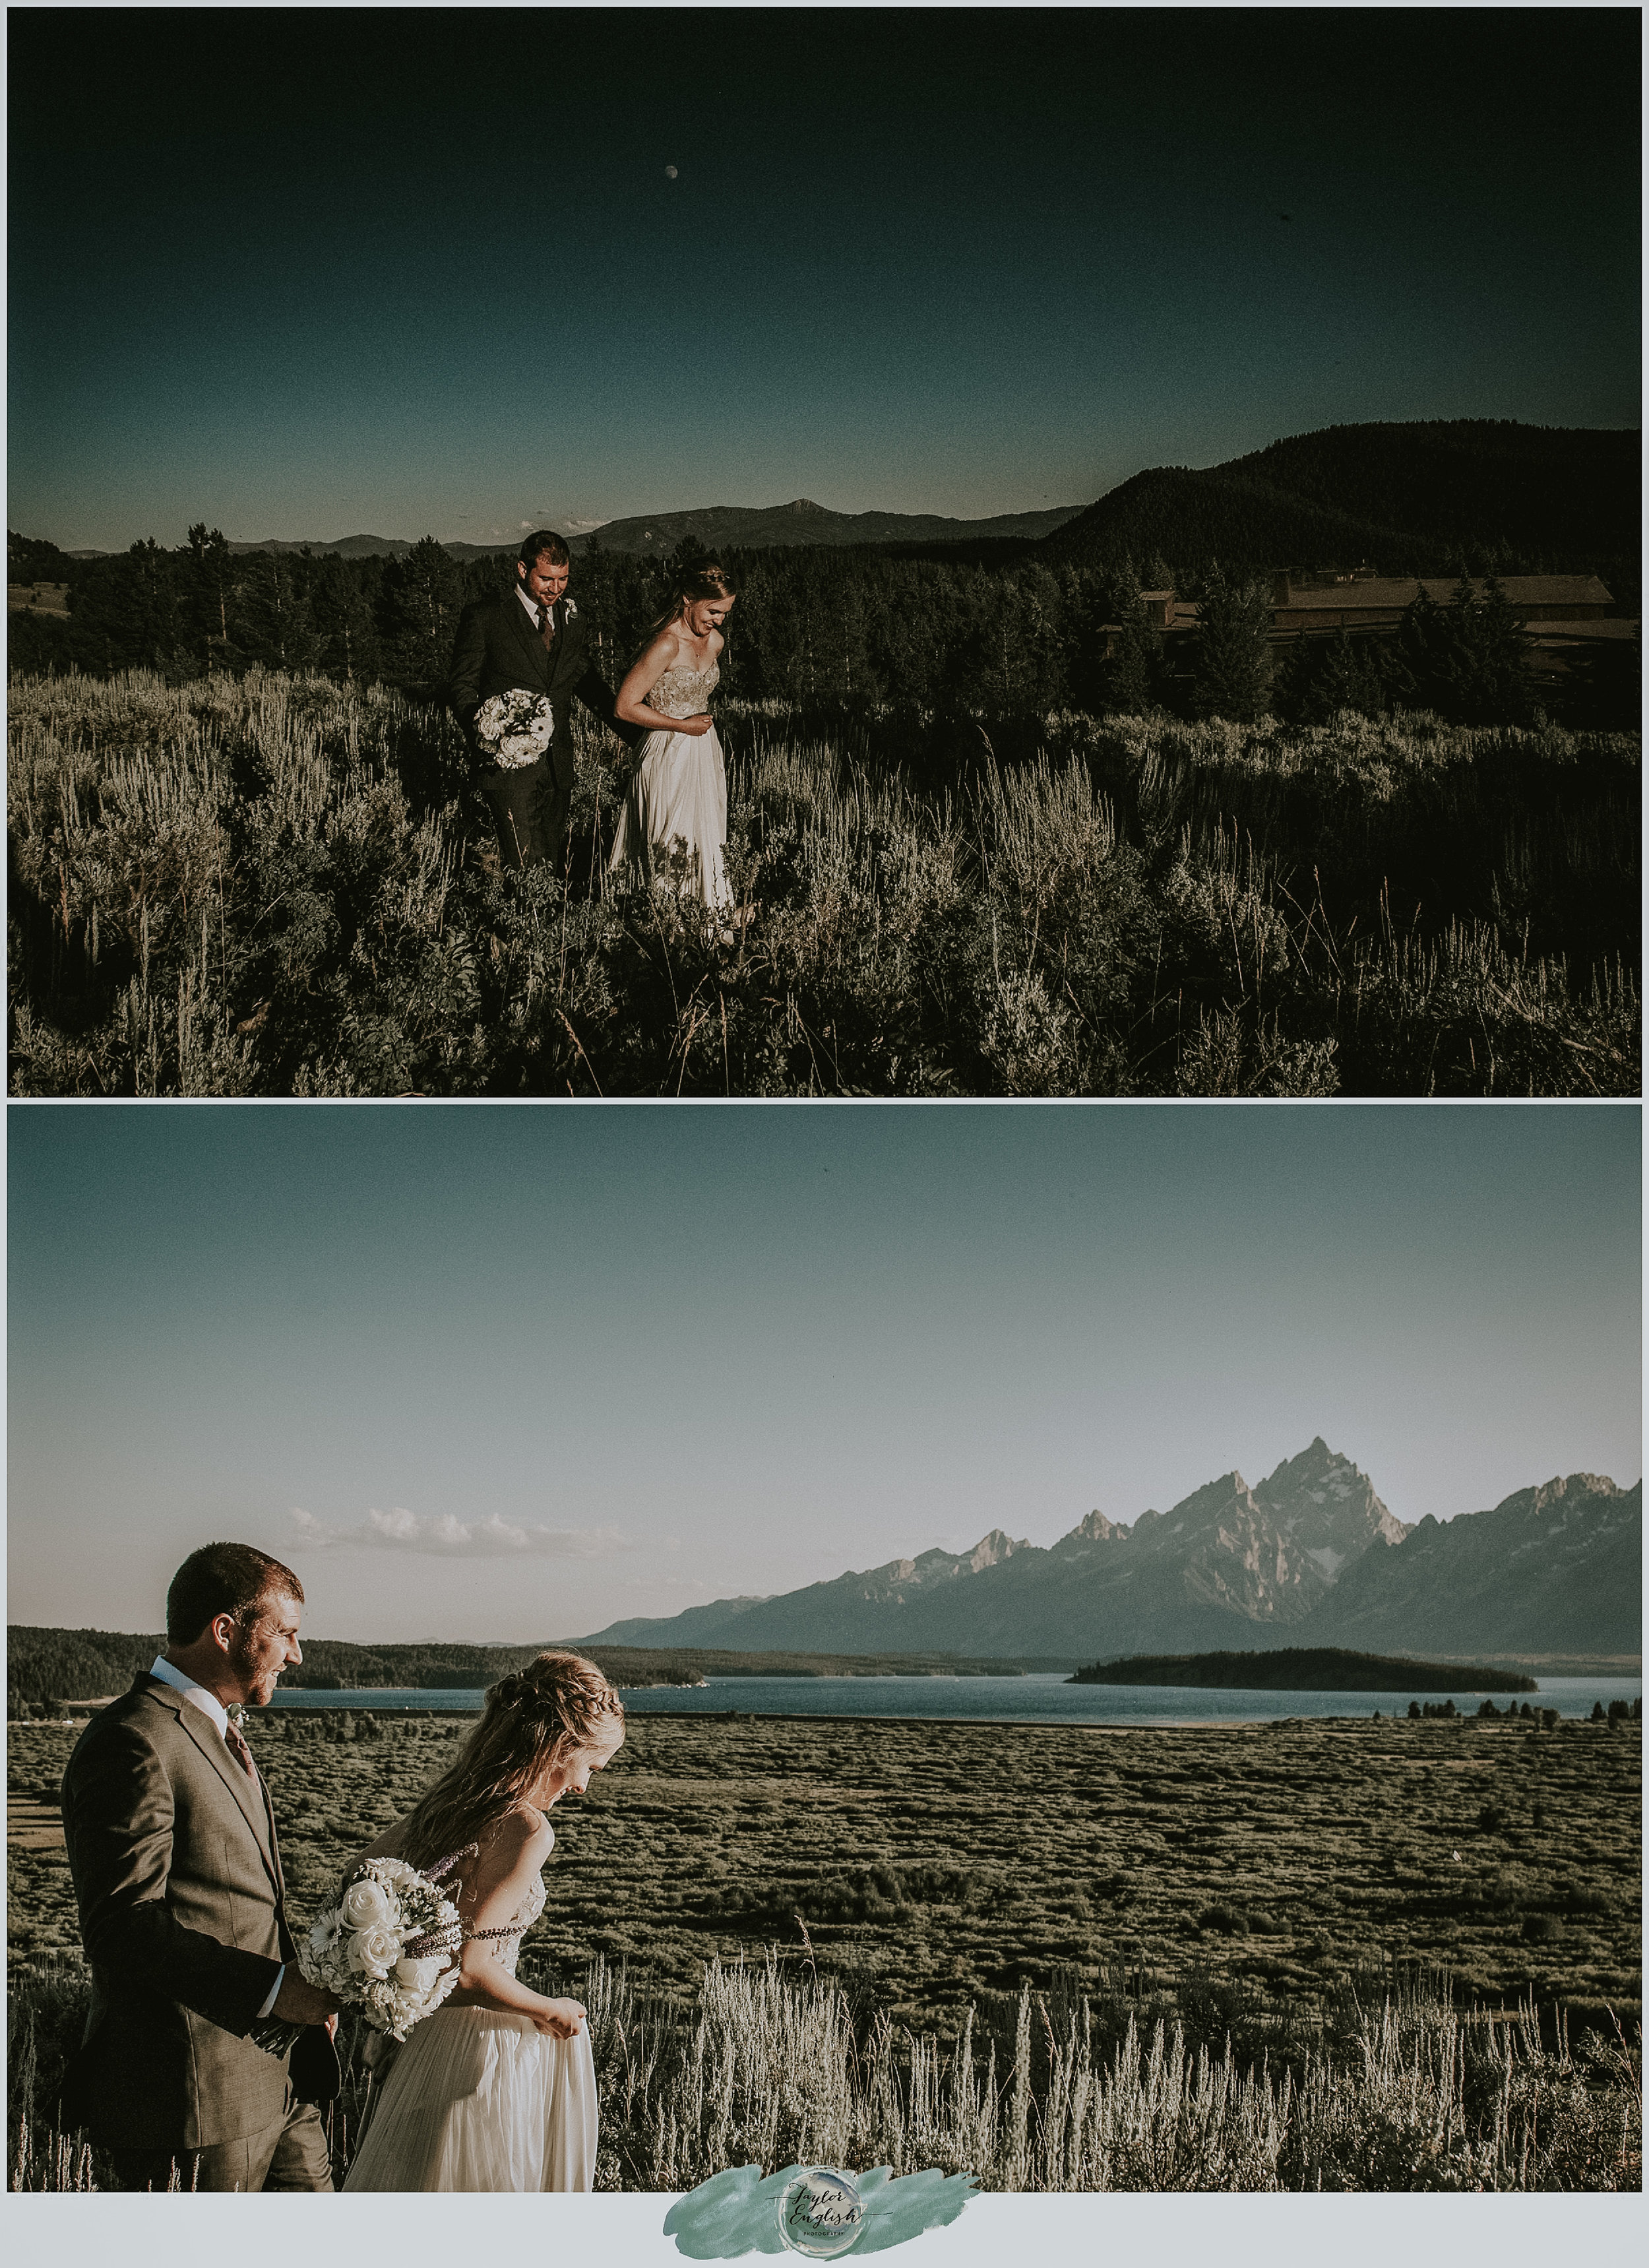 Grand_Tetons_Wedding_Photographer12